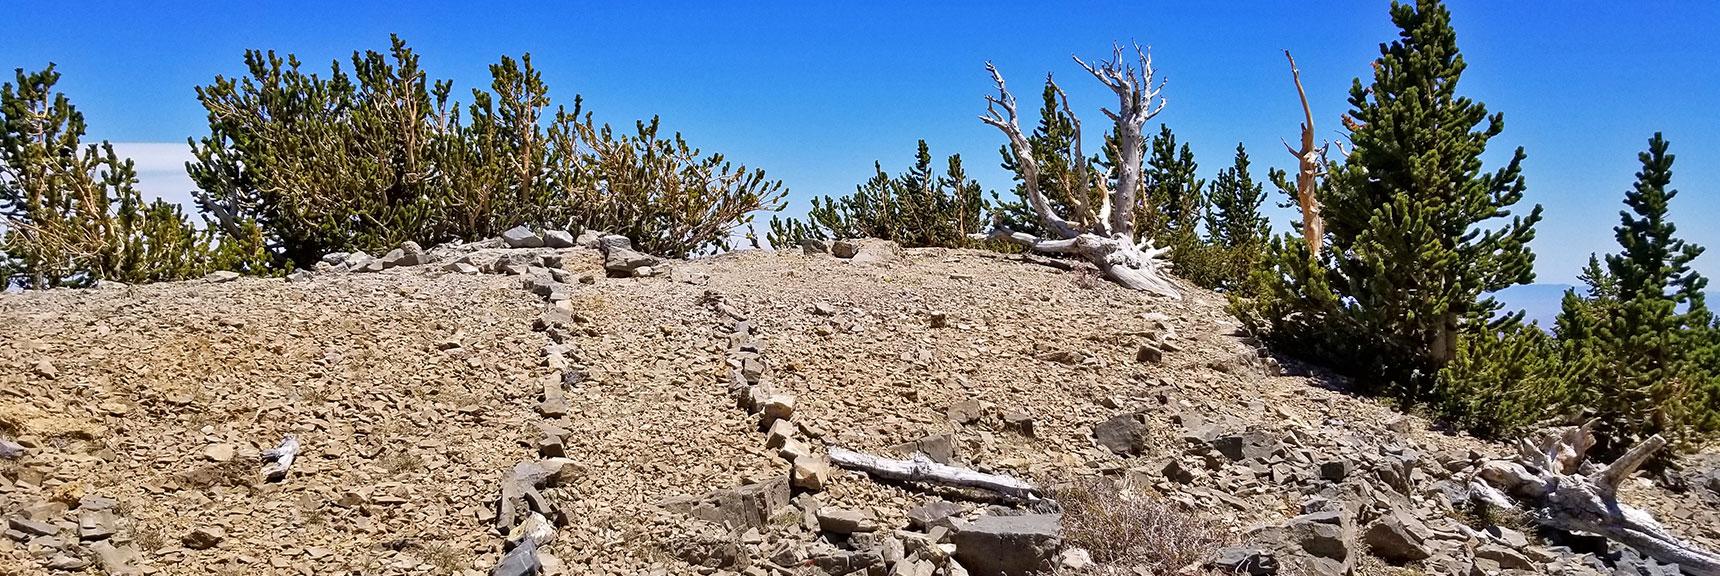 Approaching the True Summit of Mummy Mountain | Mummy Mountain Nevada Northeast Approach